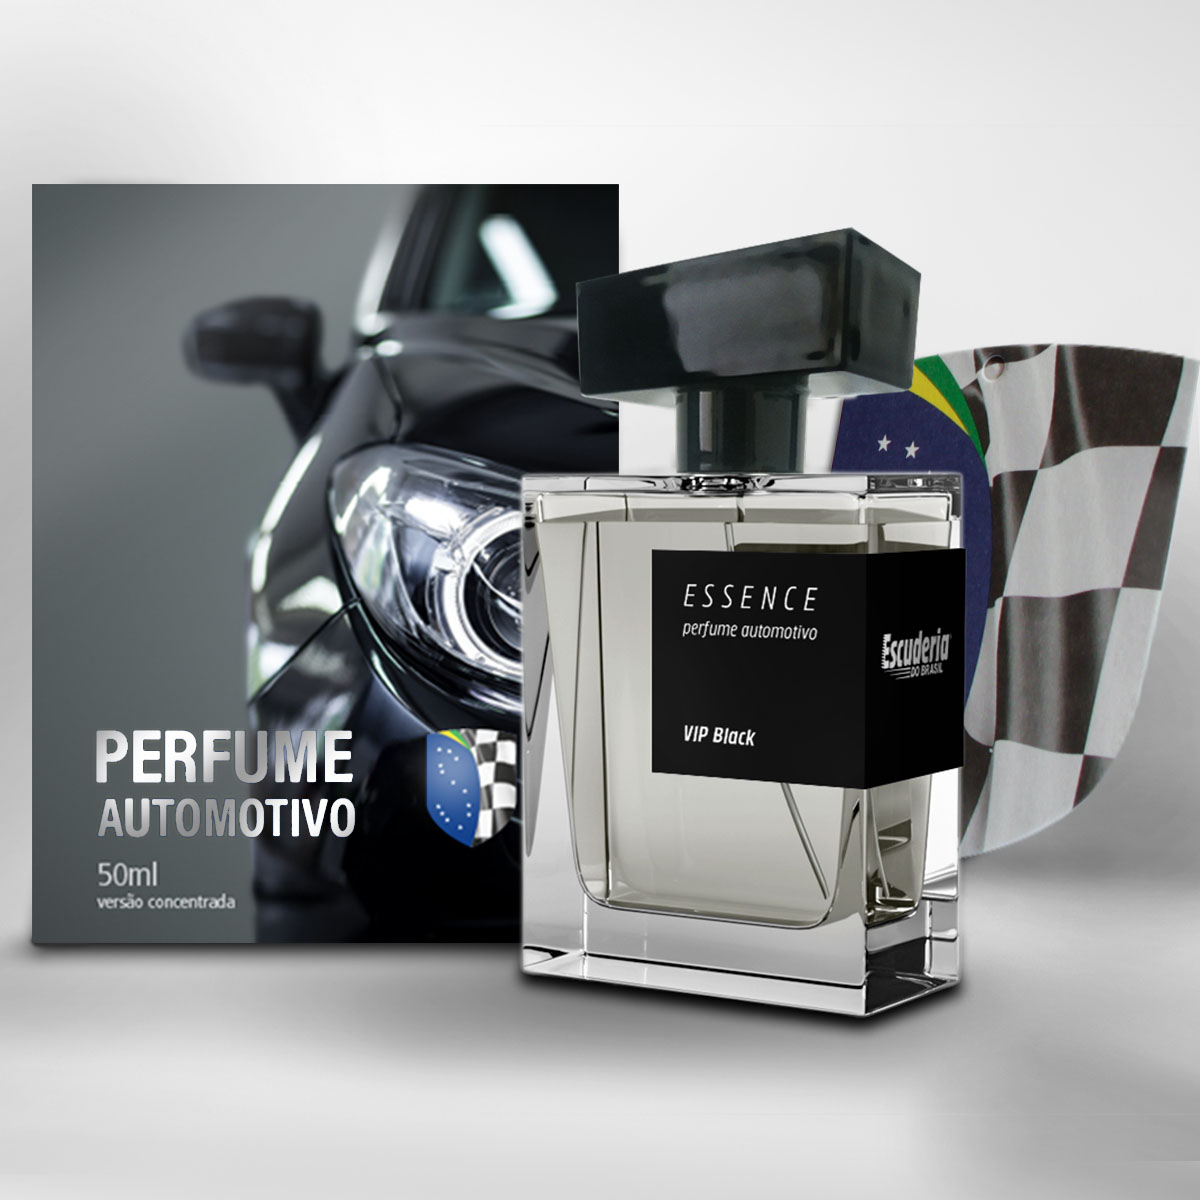 Perfume automotivo concentrado 50ml Vip Black - Escuderia do Brasil